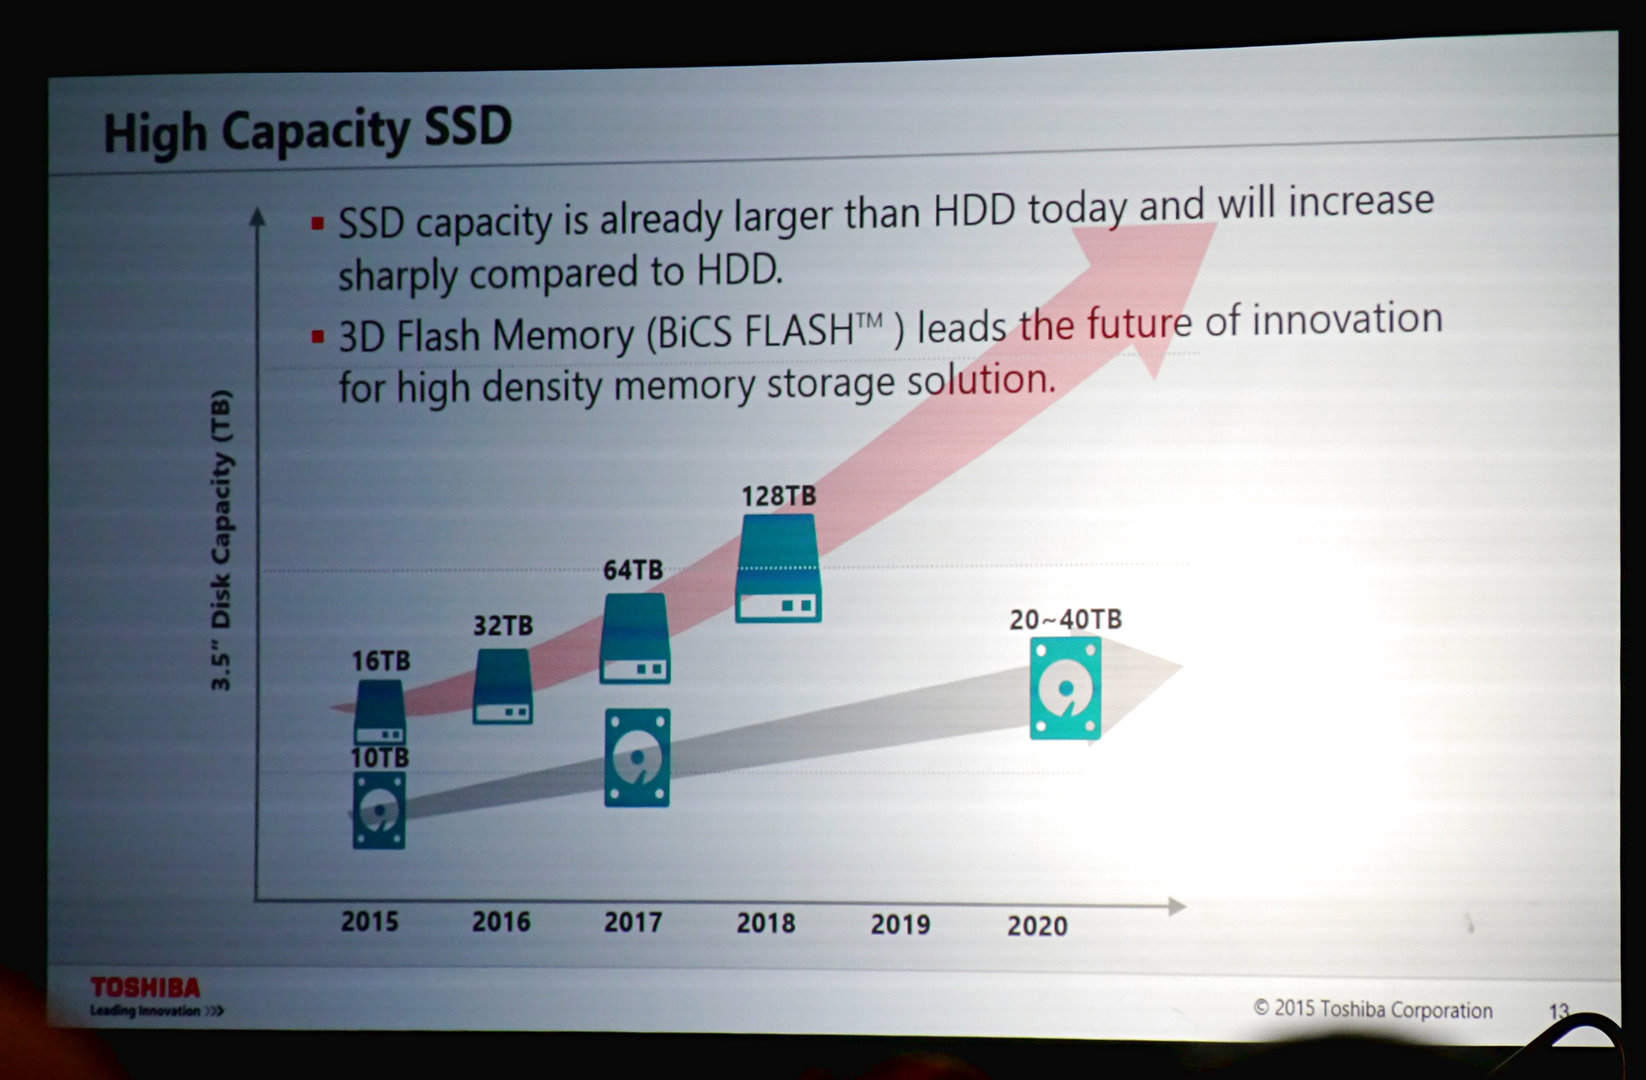 Toshibas Prognose für SSD-Kapazitäten